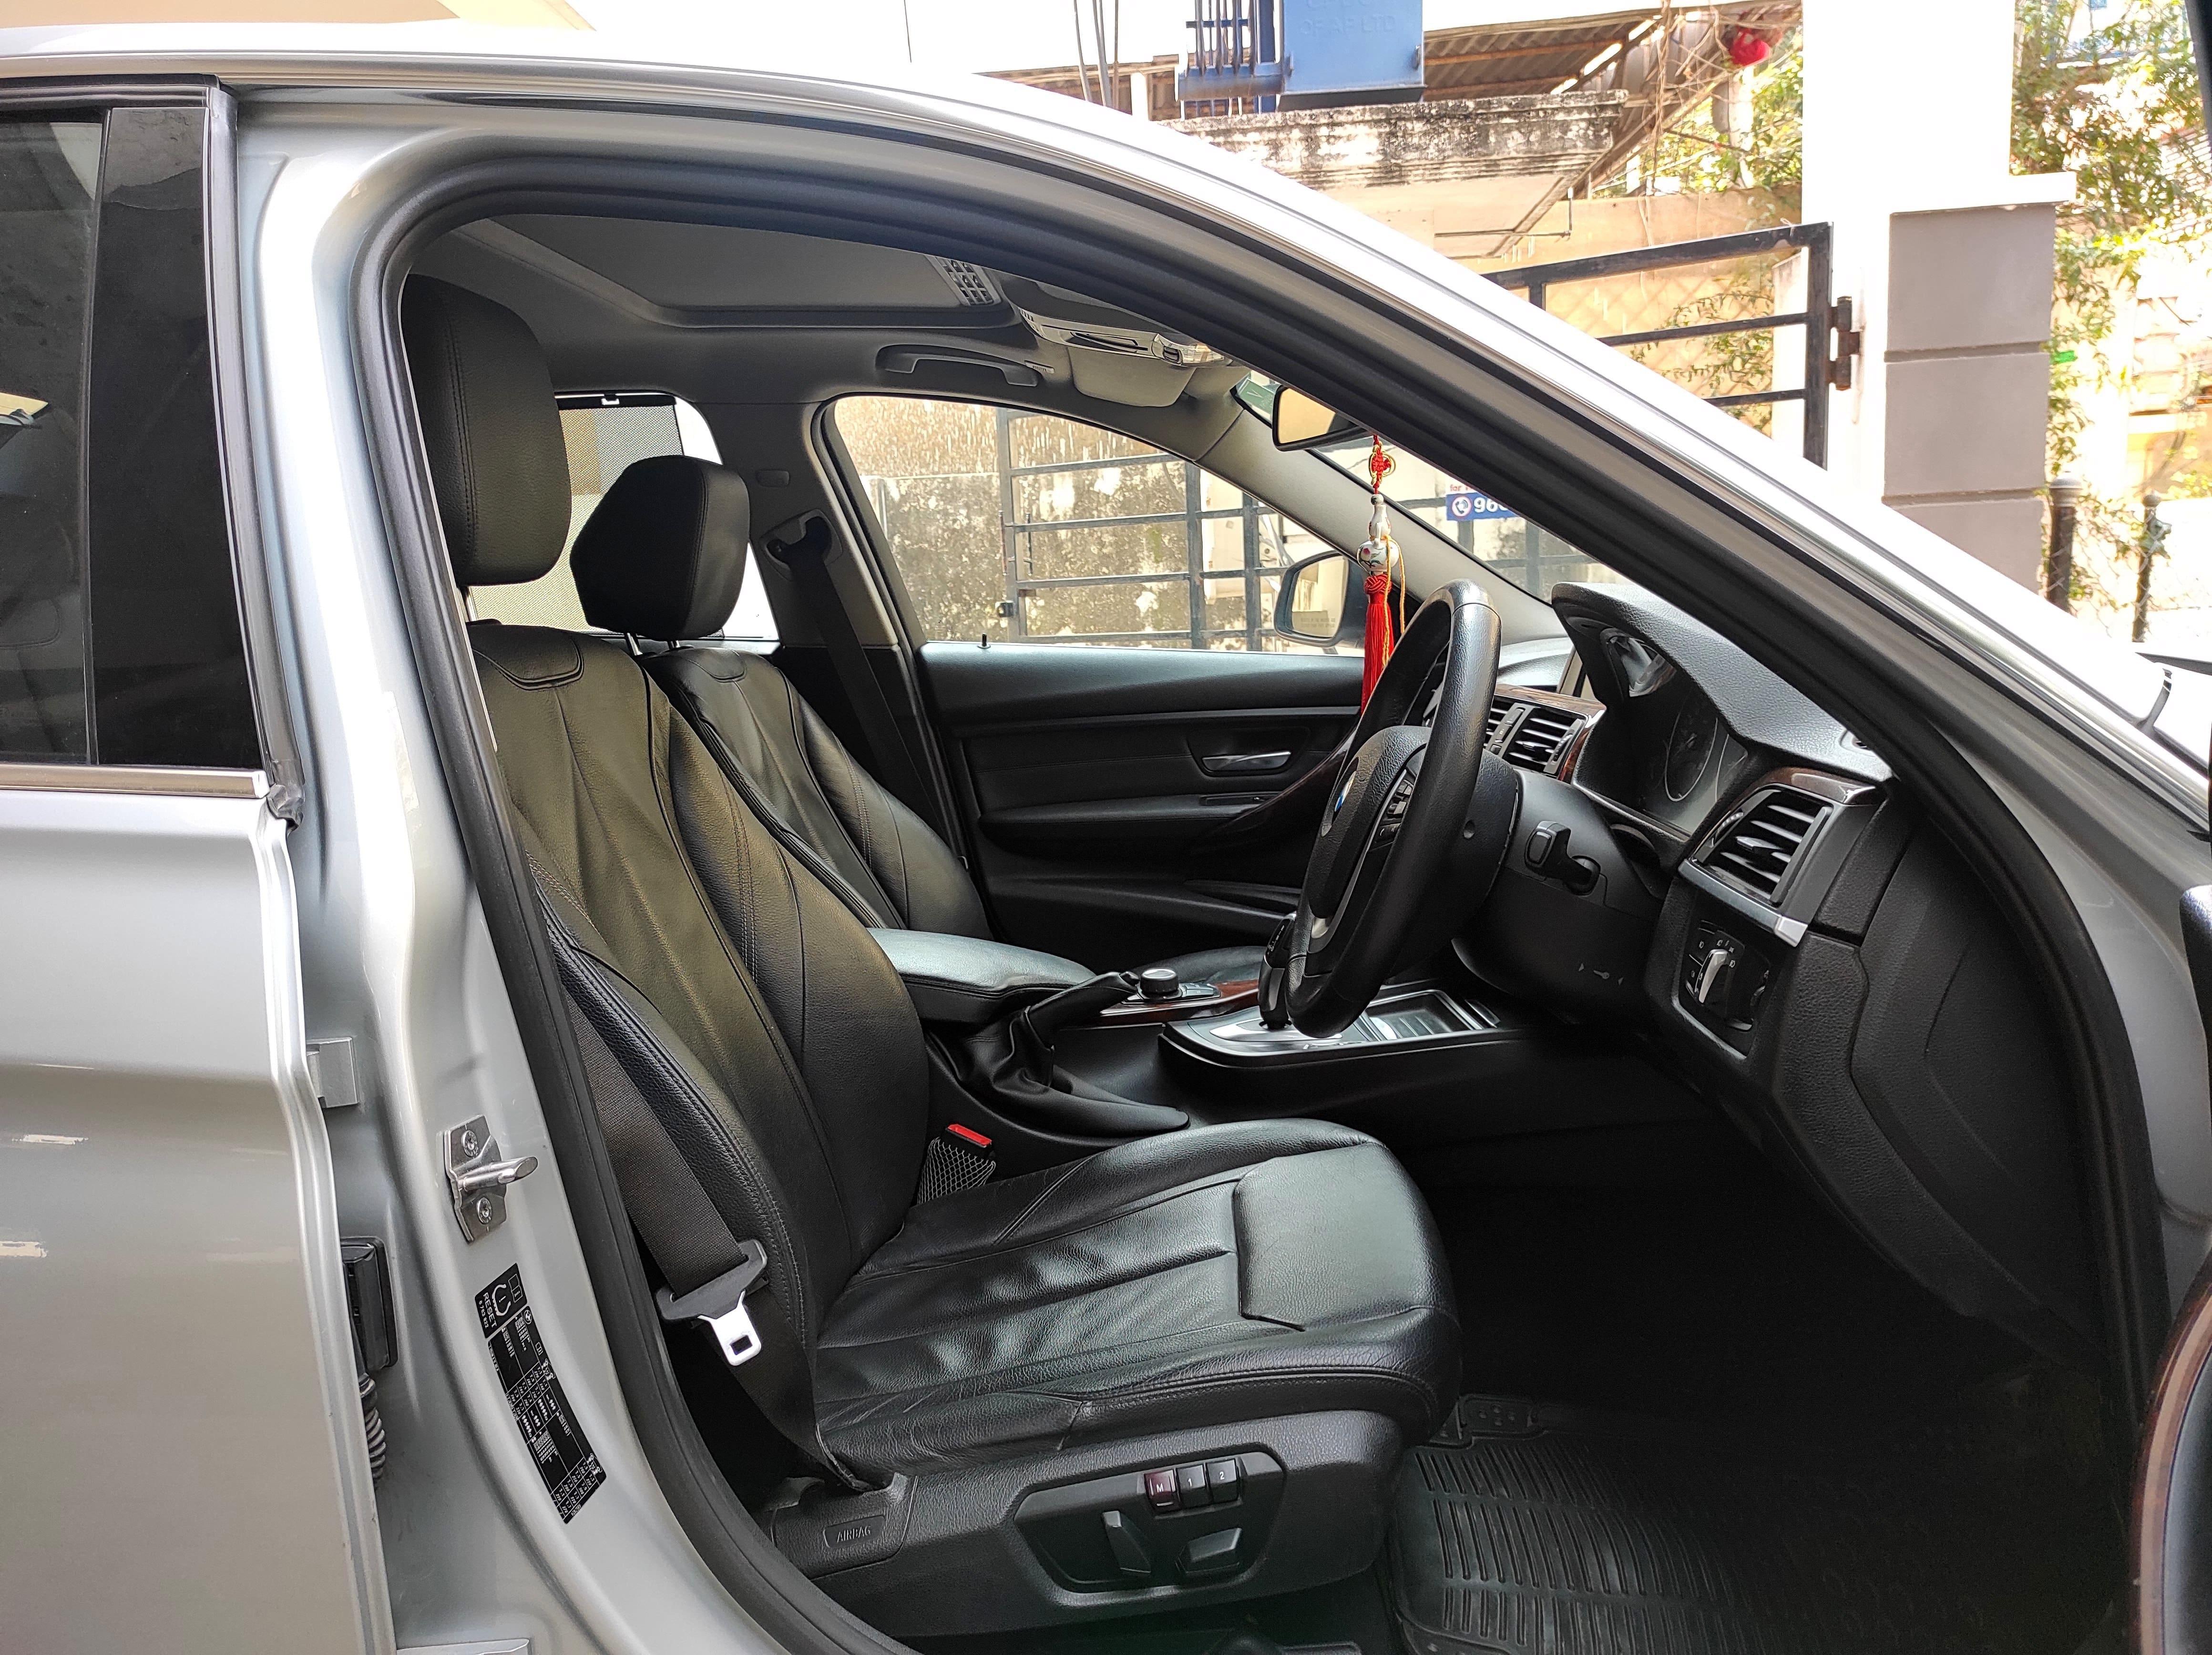 BMW 3 Series 2011-2015 320d Luxury Plus